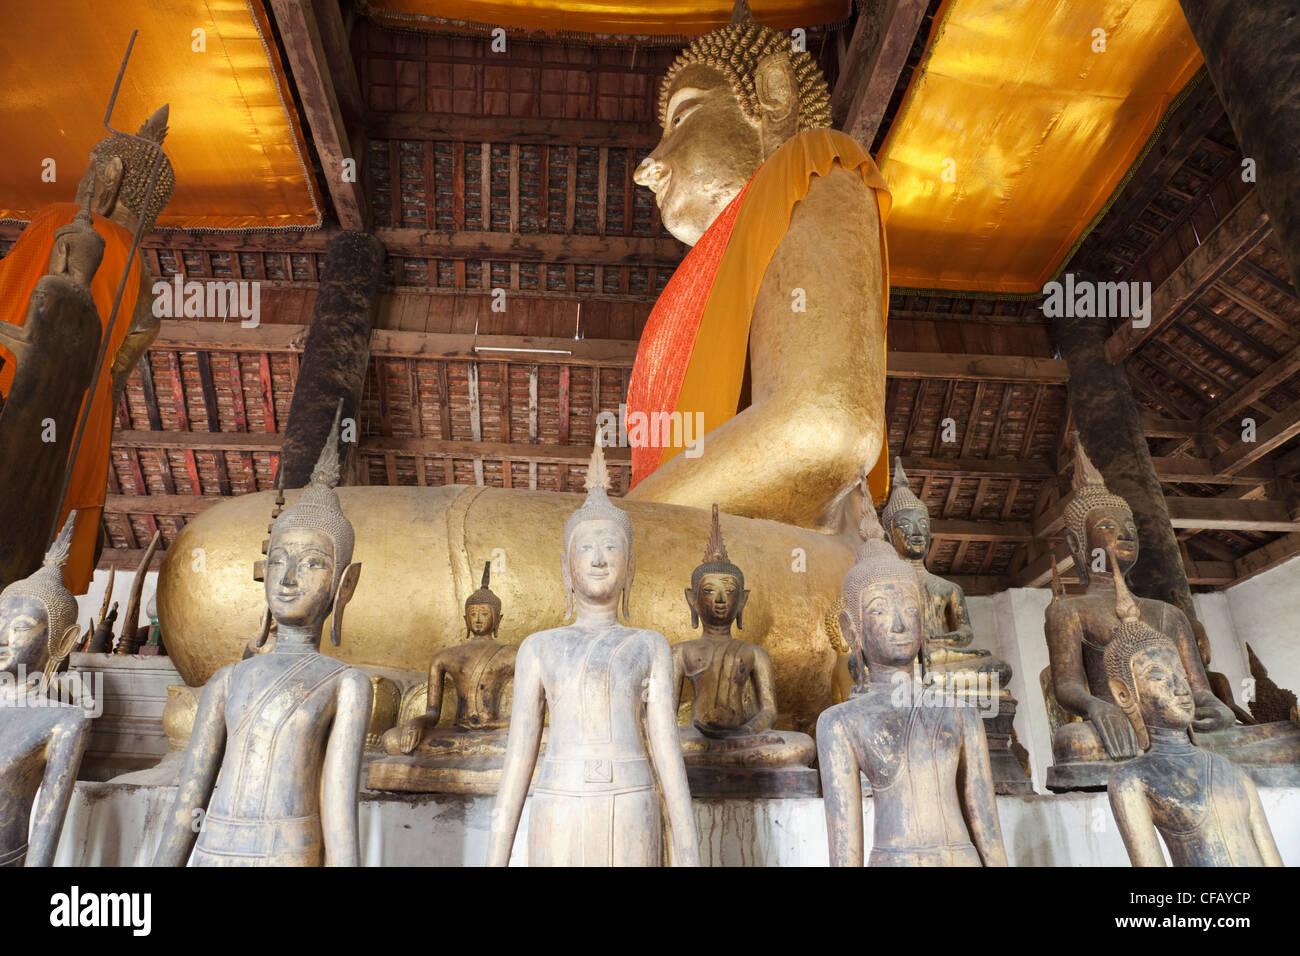 Laos, Luang Prabang, Wat Wisunarat aka Wat Visoun, The Main Prayer Hall Collection of Buddha Statues - Stock Image